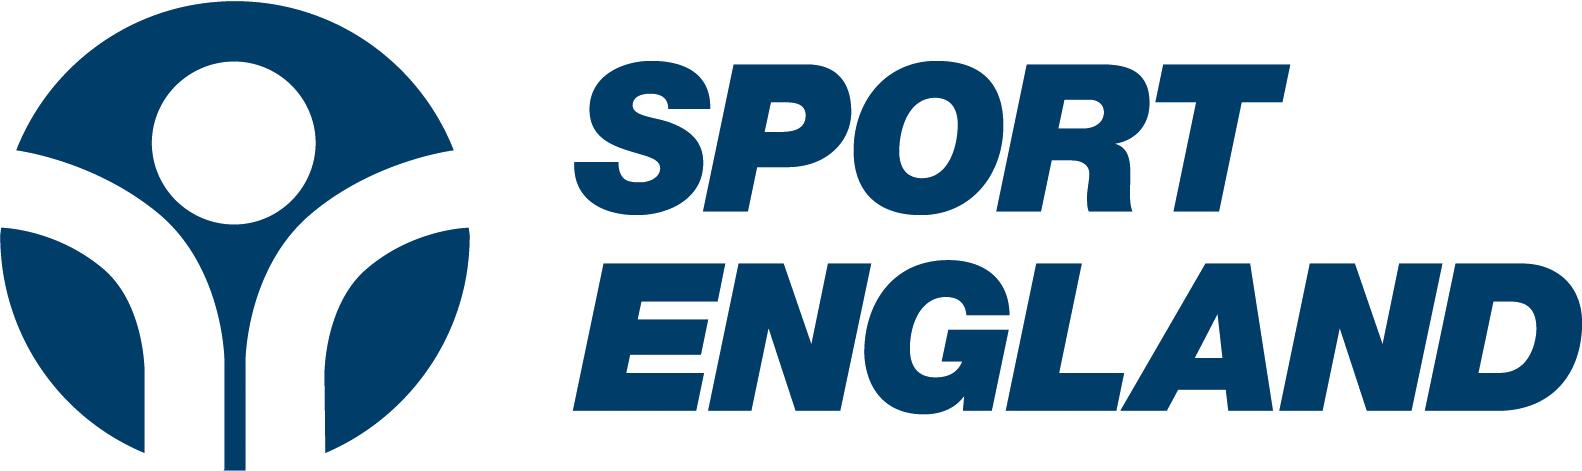 Sports England